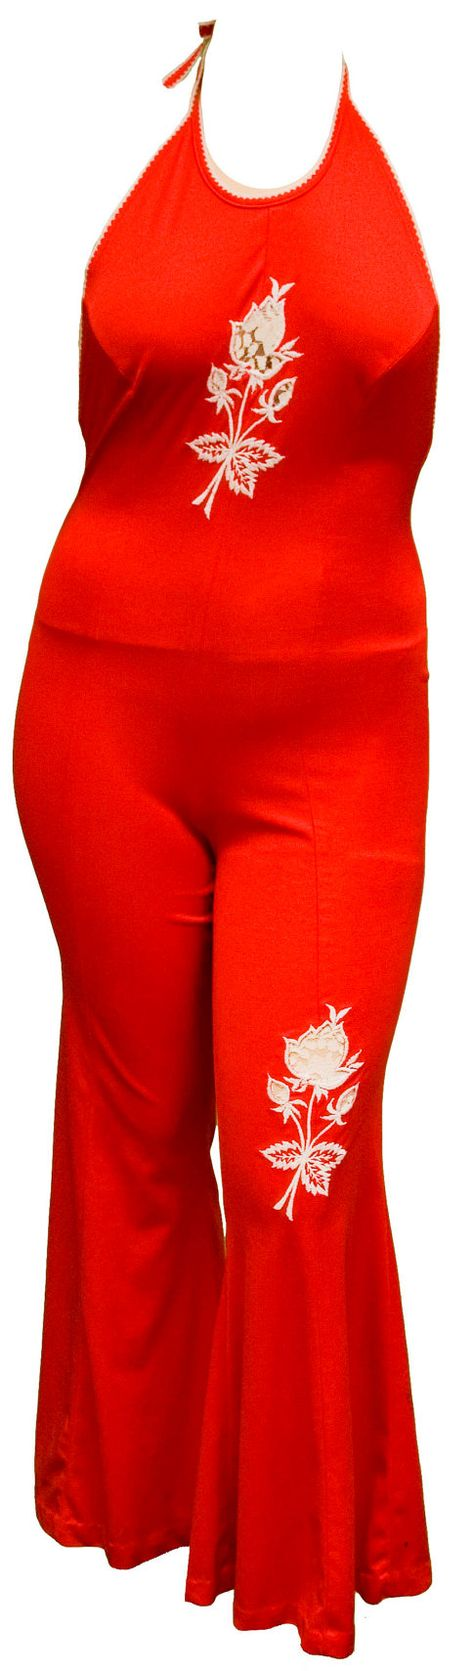 1970s Large Romper Onesie Halter Pant Suit Red by TopangaHiddenT